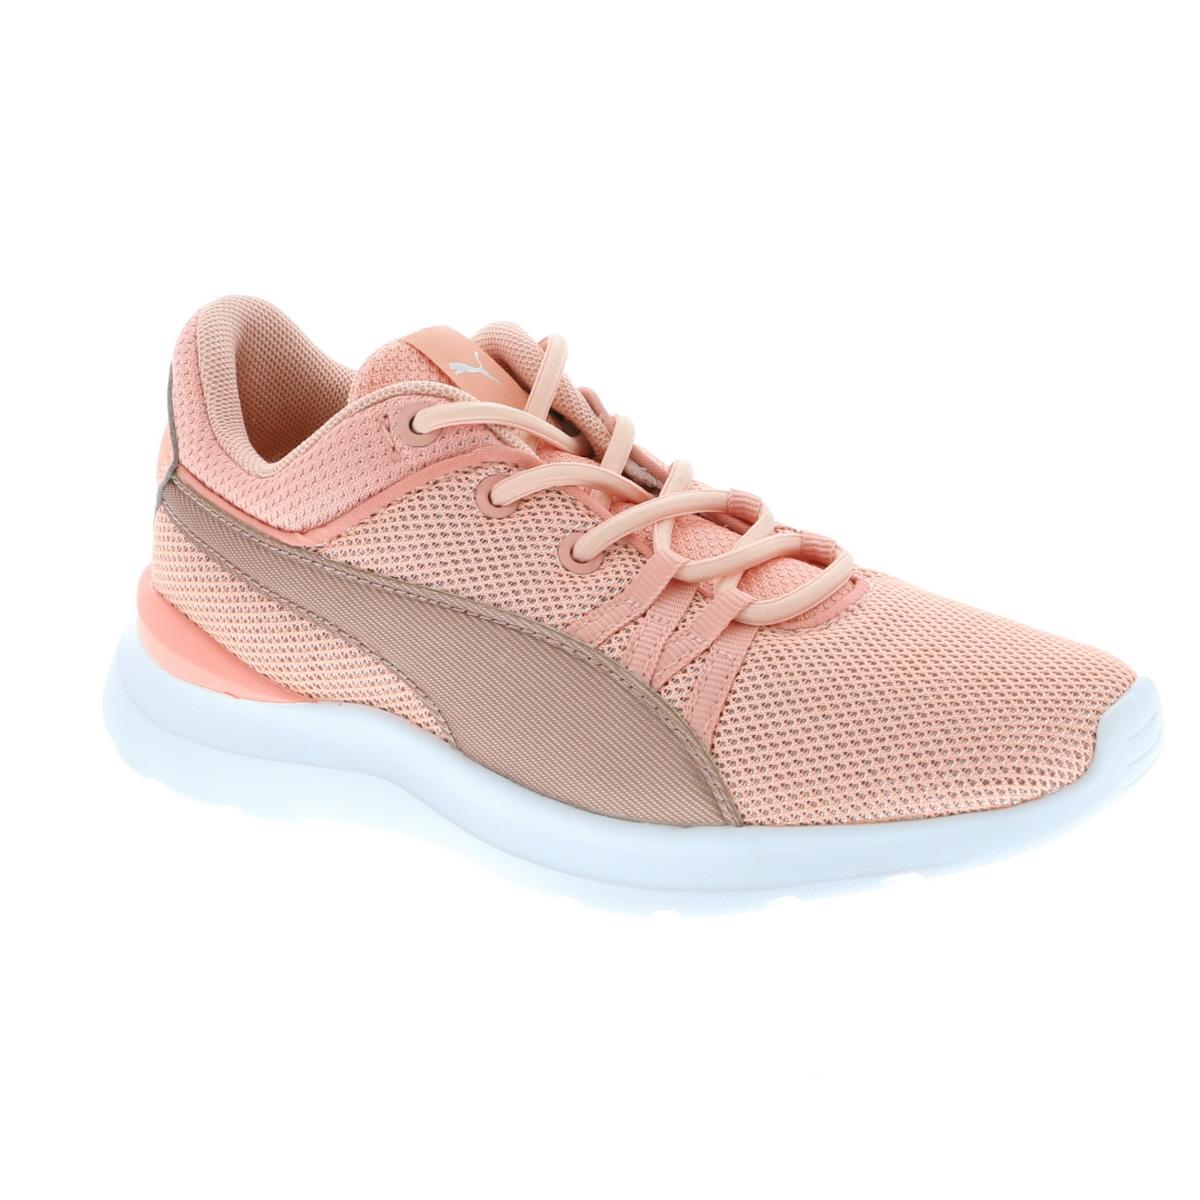 b1f8dbfc596 Puma sneakers bestel je online bij